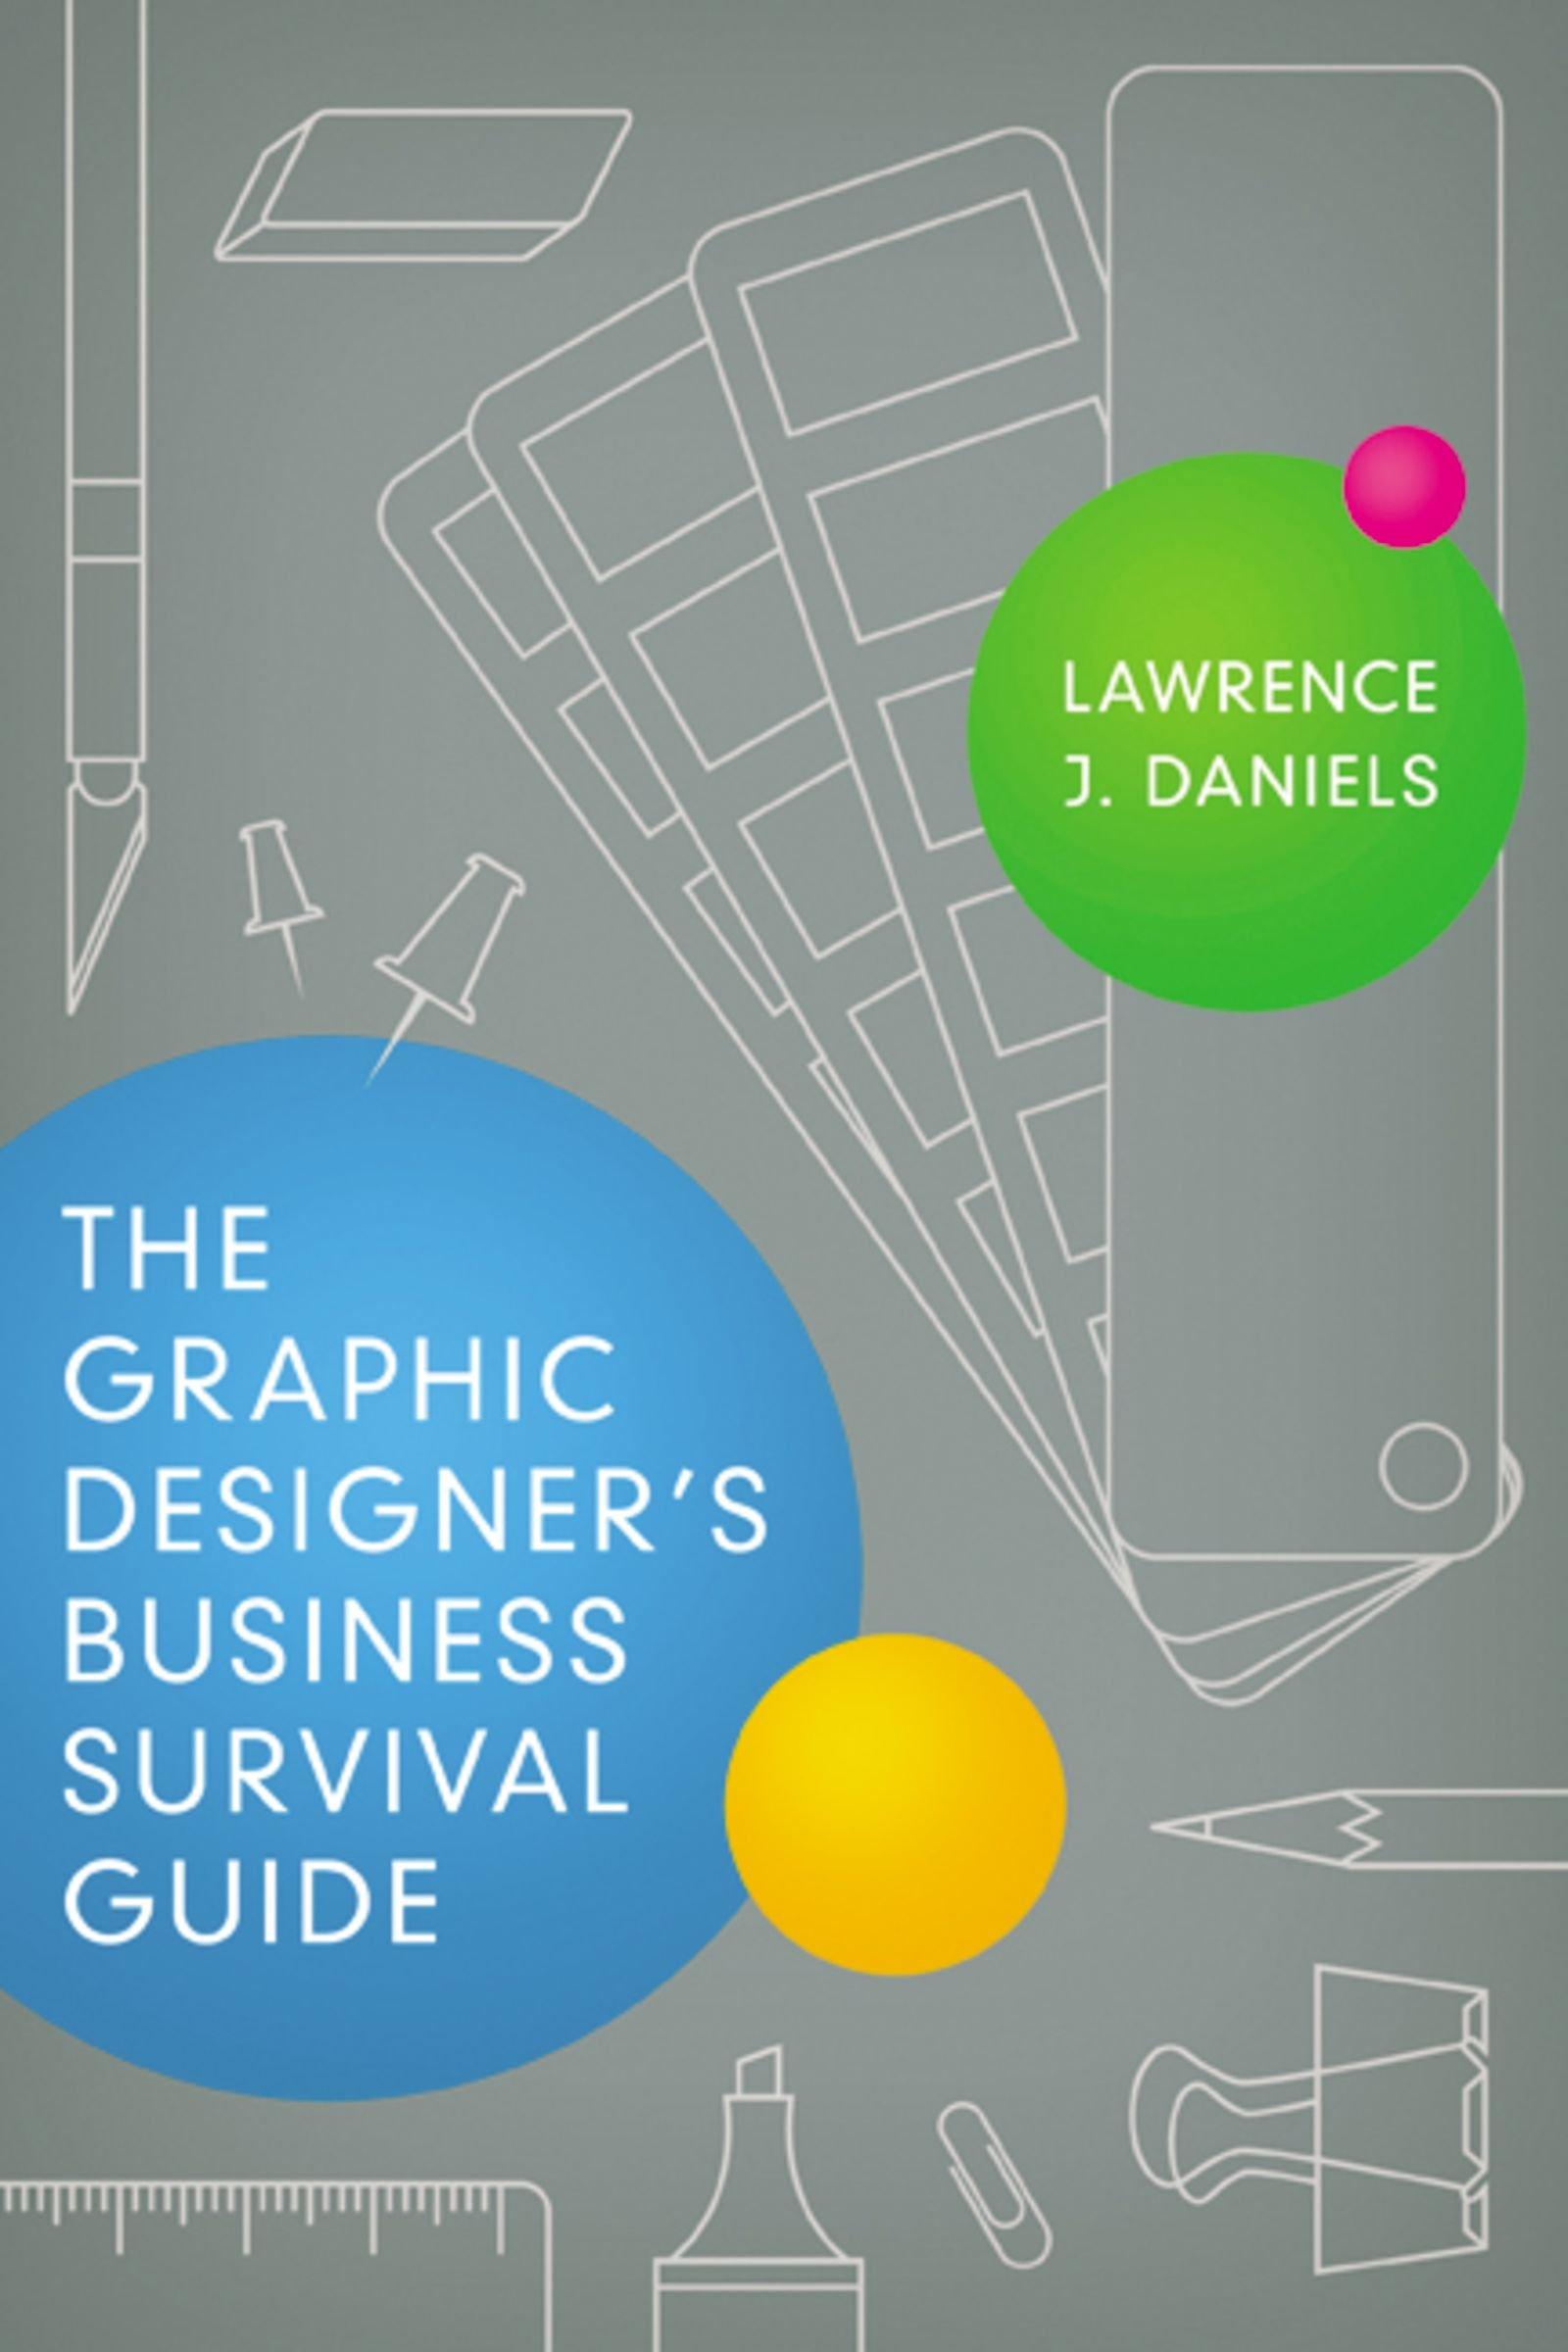 The Graphic Designer's Business Survival Guide ebook